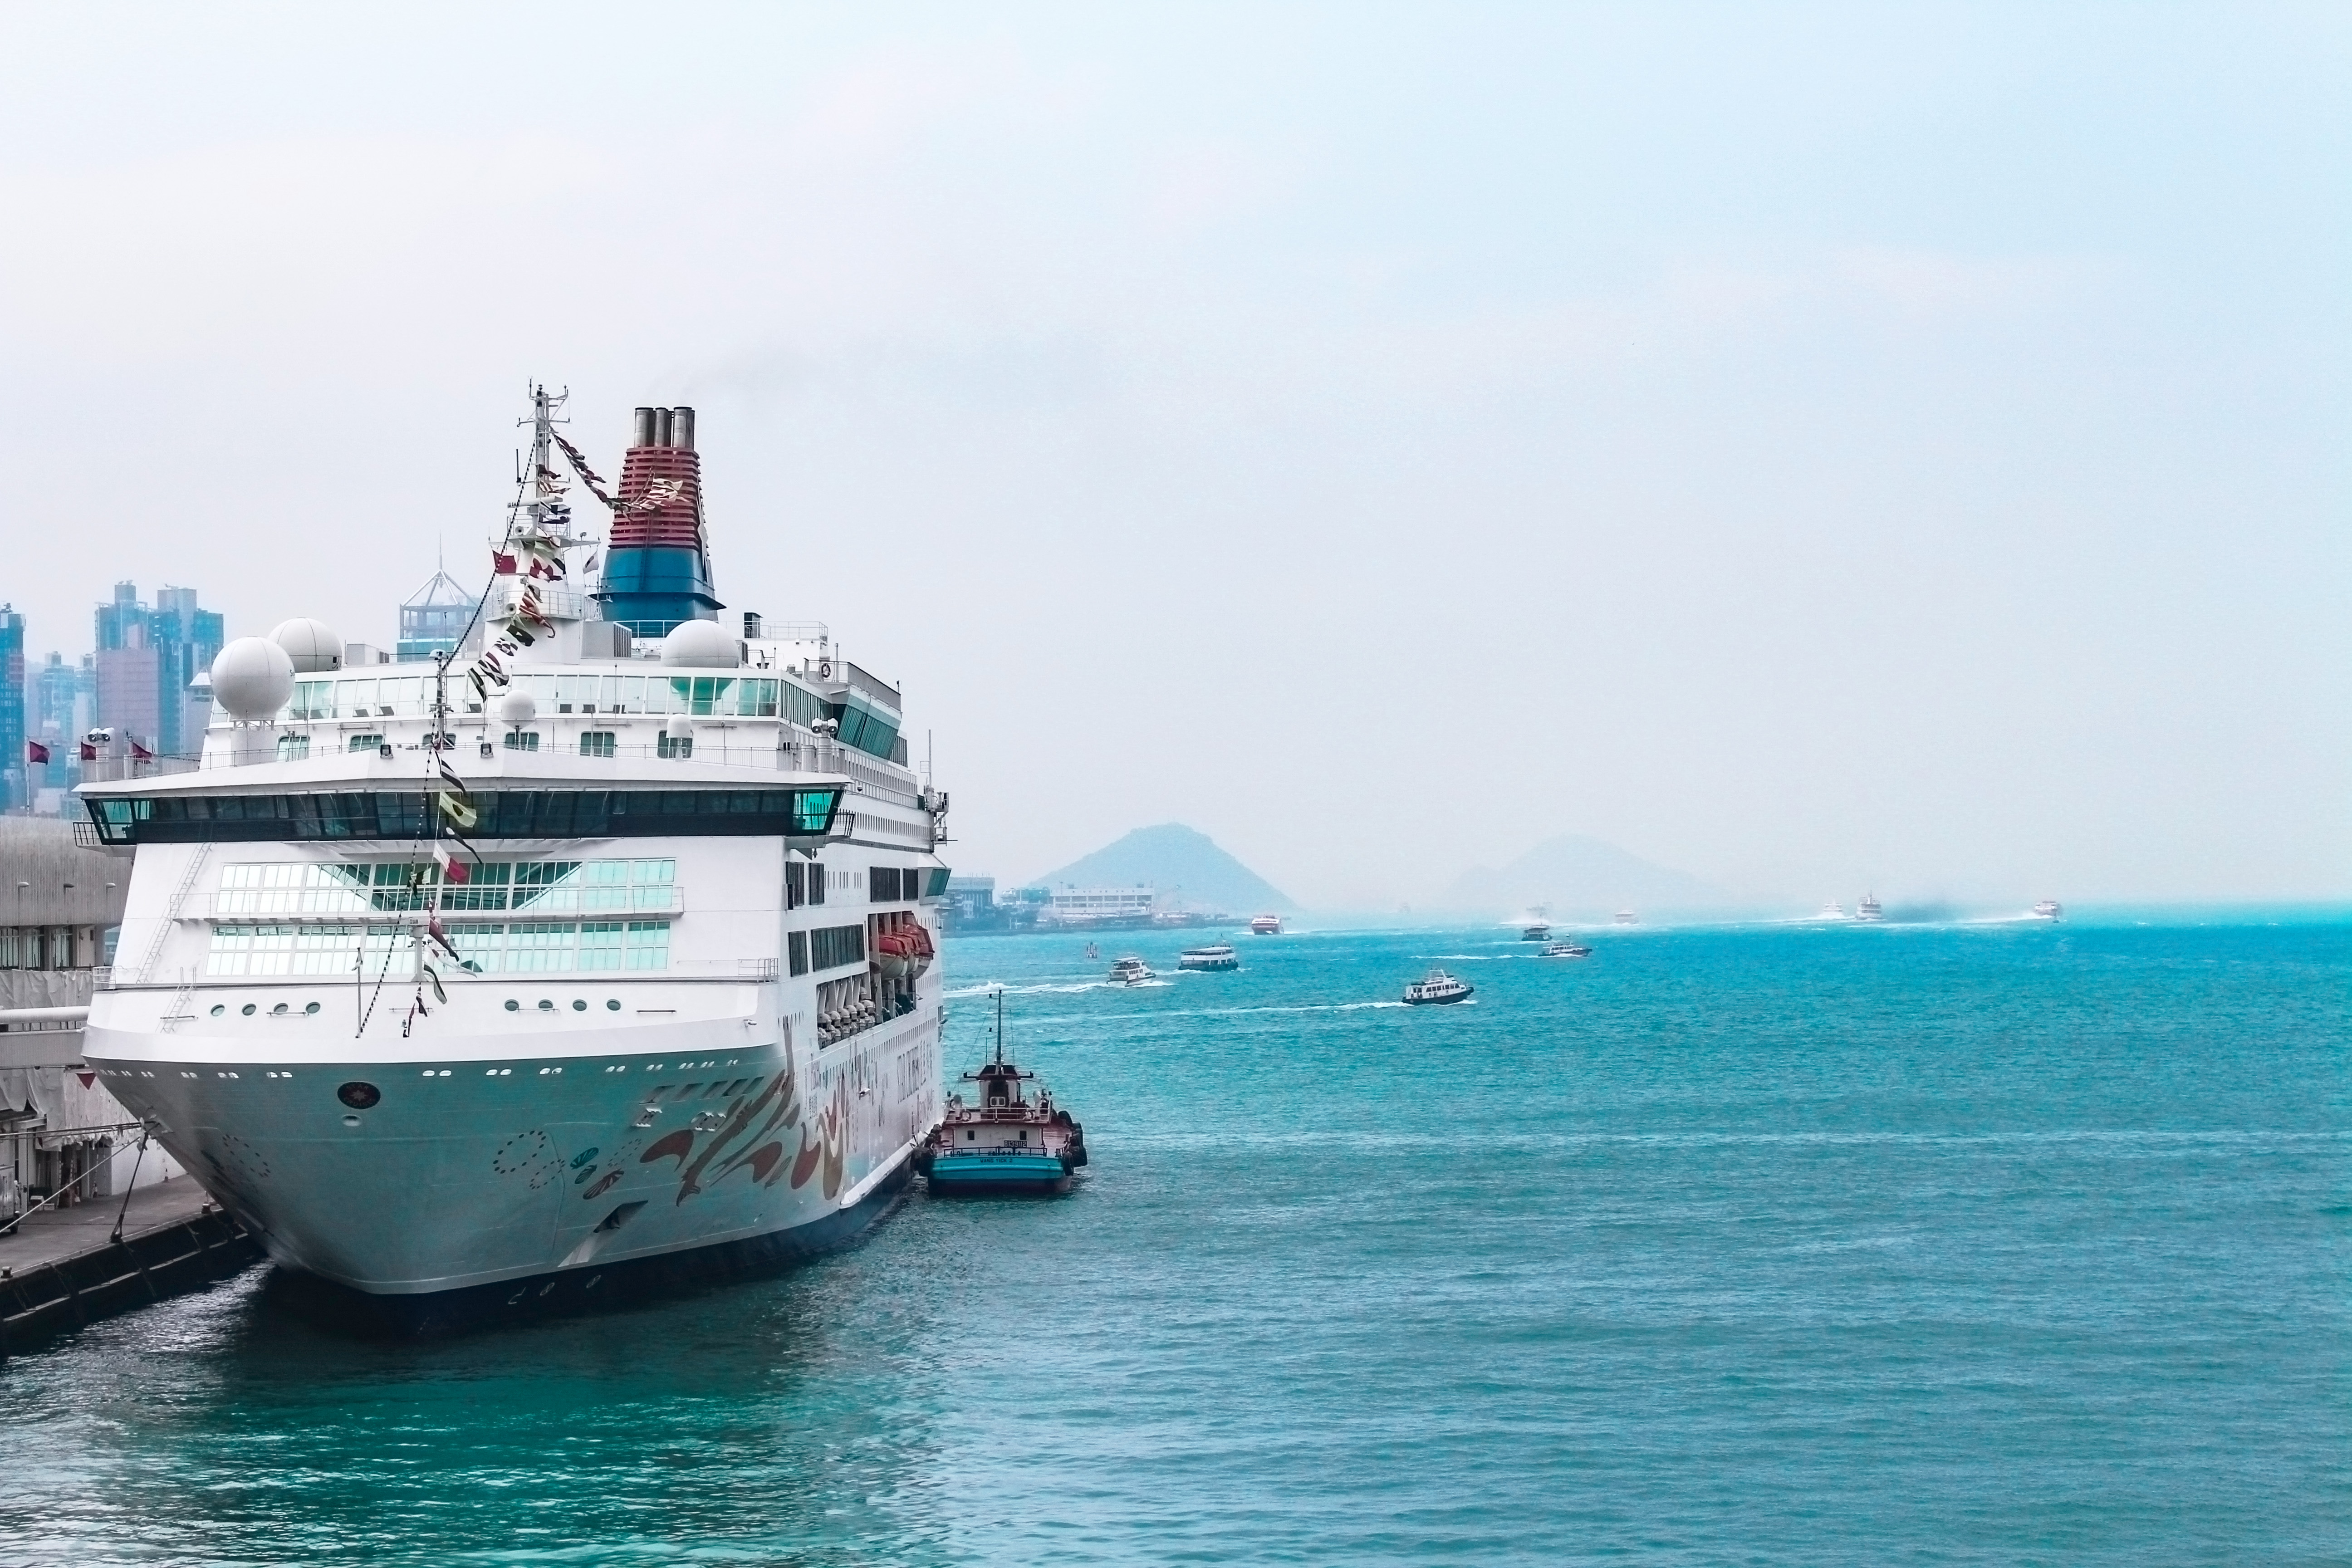 White Cruise Ship Docking in Port